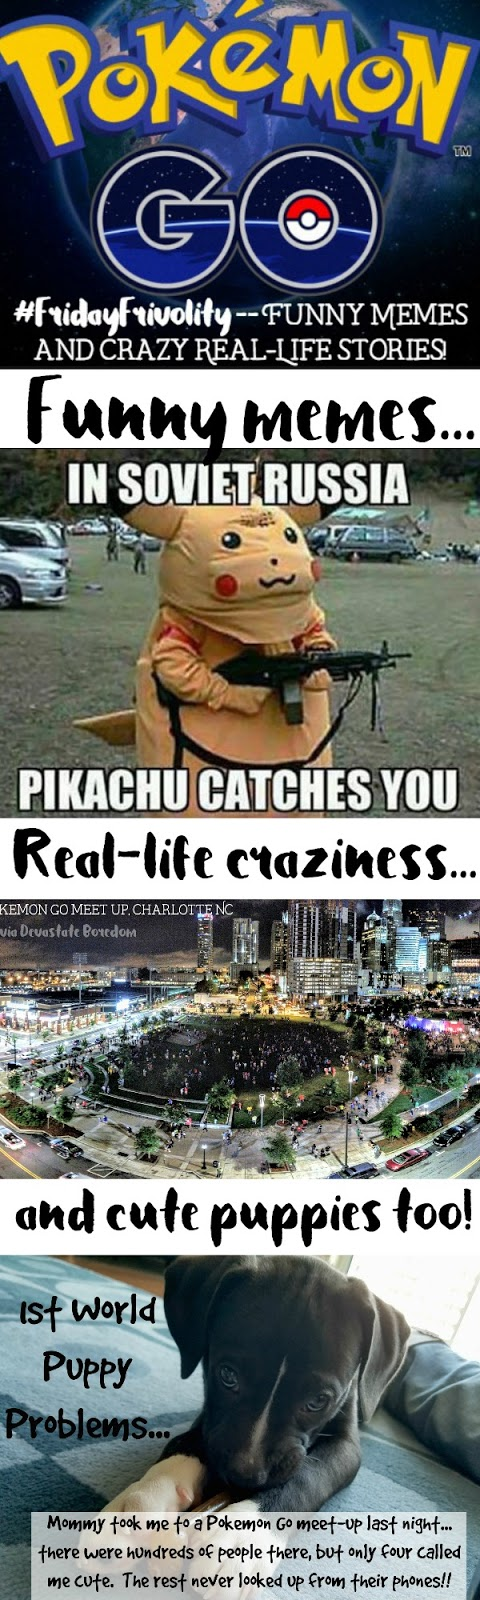 Funny Meme Real Life : Fridayfrivolity pokemon go funny memes my own real